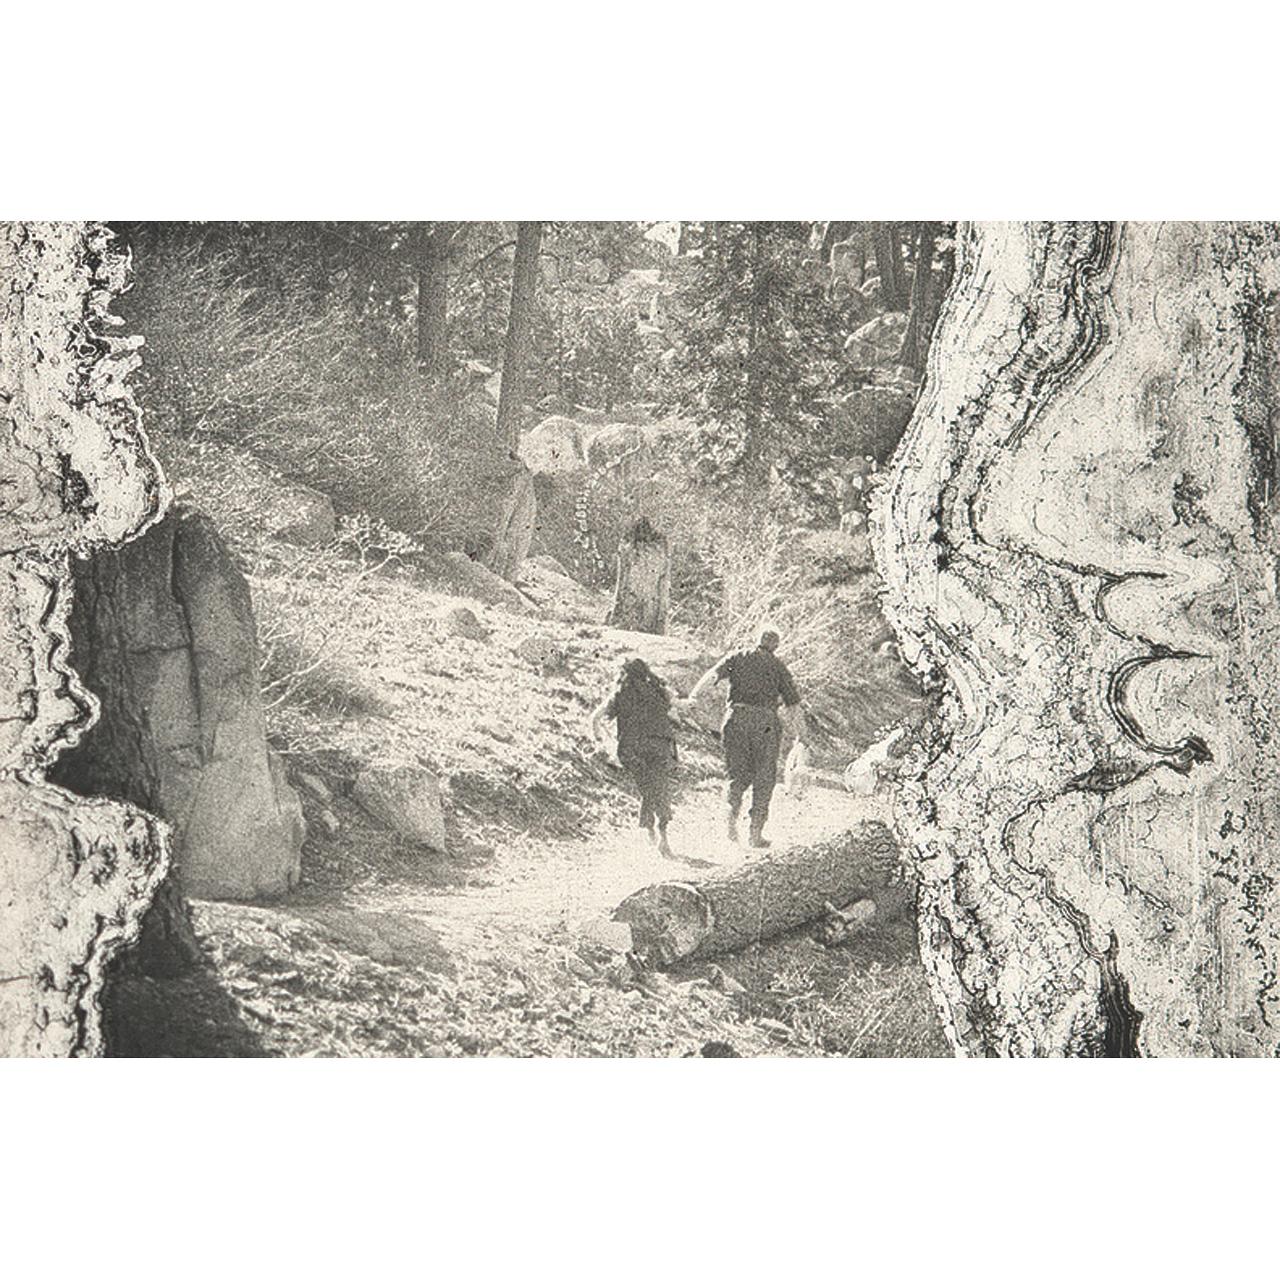 18MICKEY-1080-18in24 1945.jpg